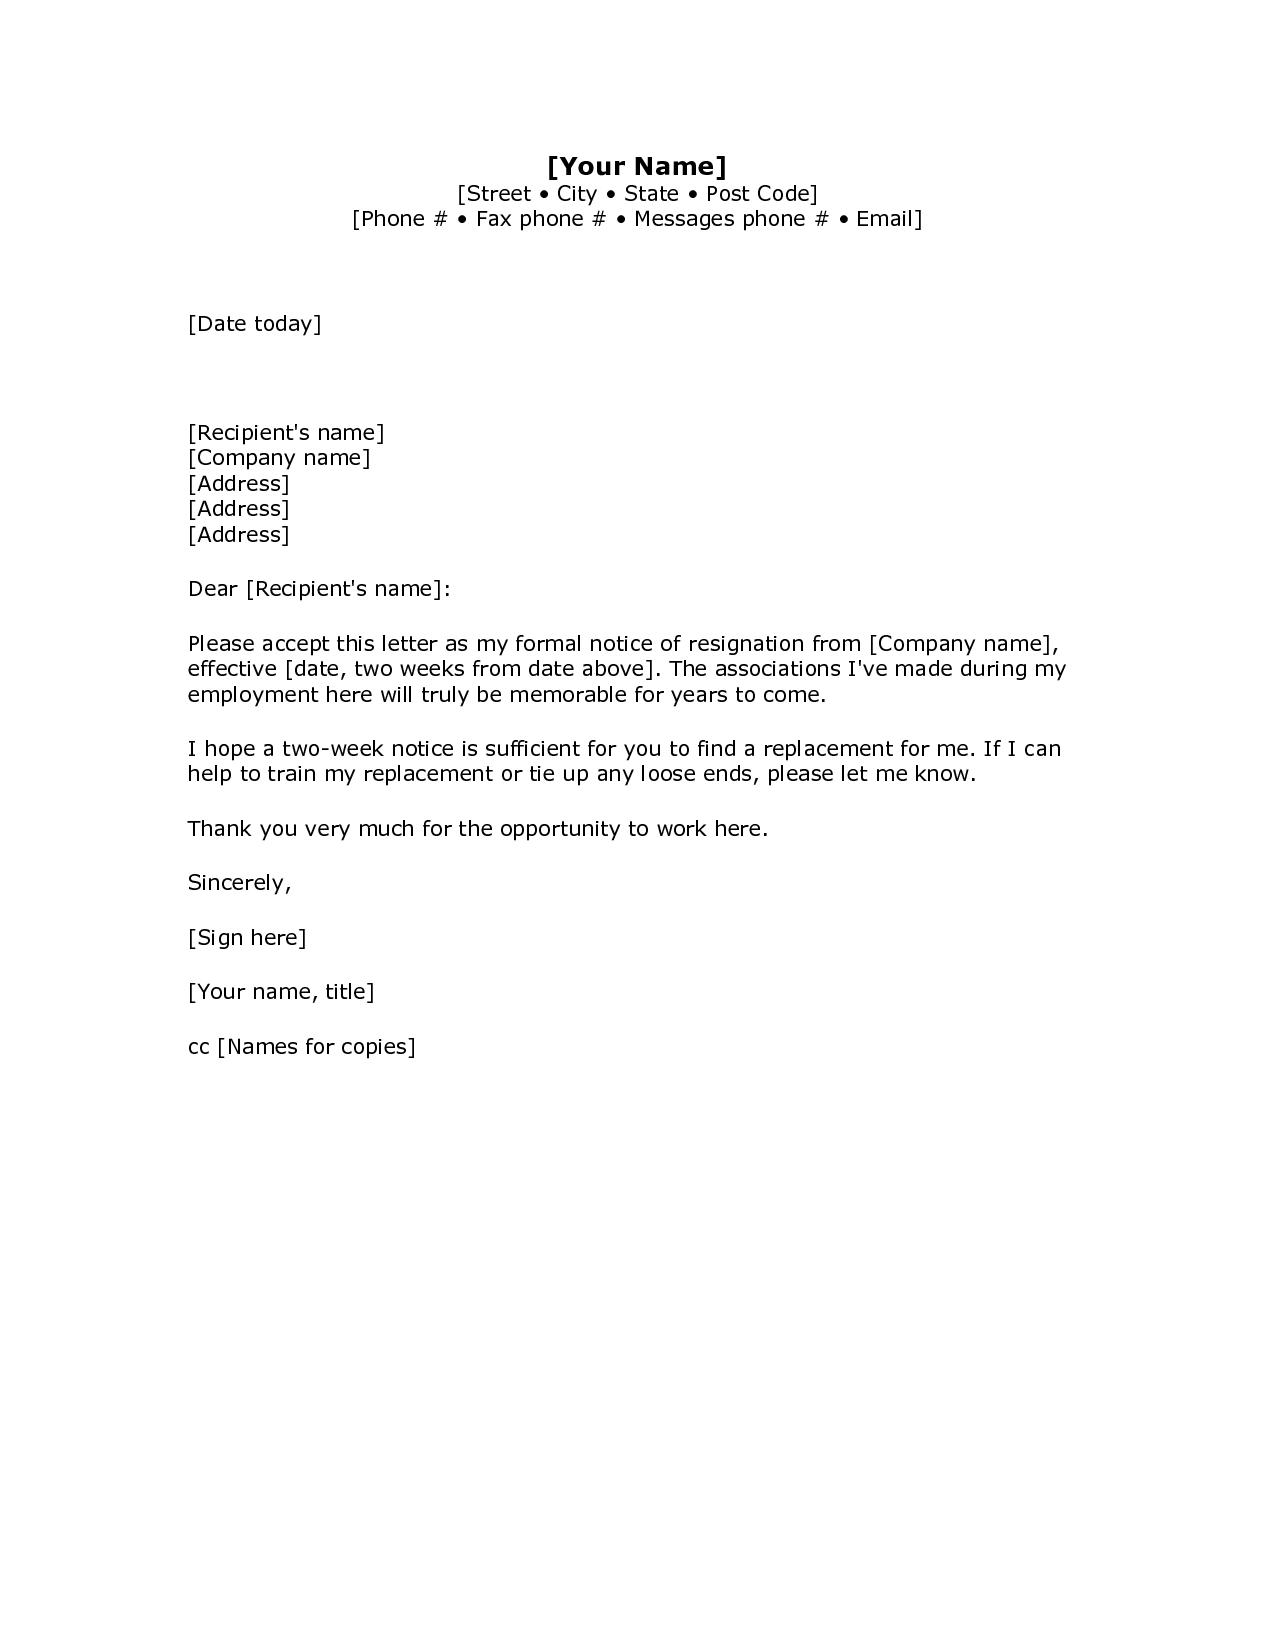 Formal Resignation Letter Template - 2 Weeks Notice Letter Resignation Letter Week Notice Words Hdwriting